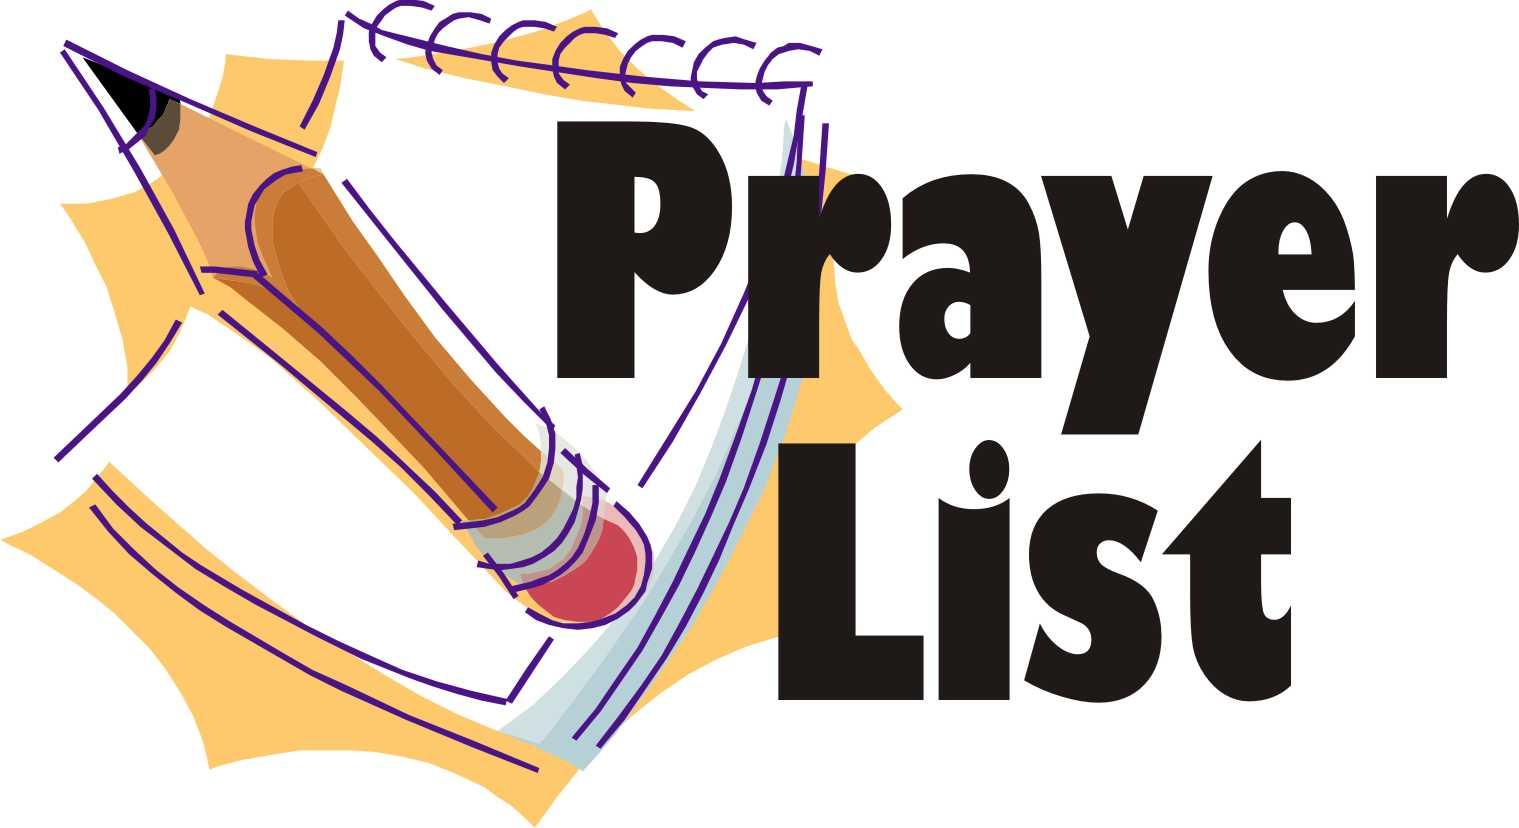 Christian Prayer Clipart - Clipart Kid